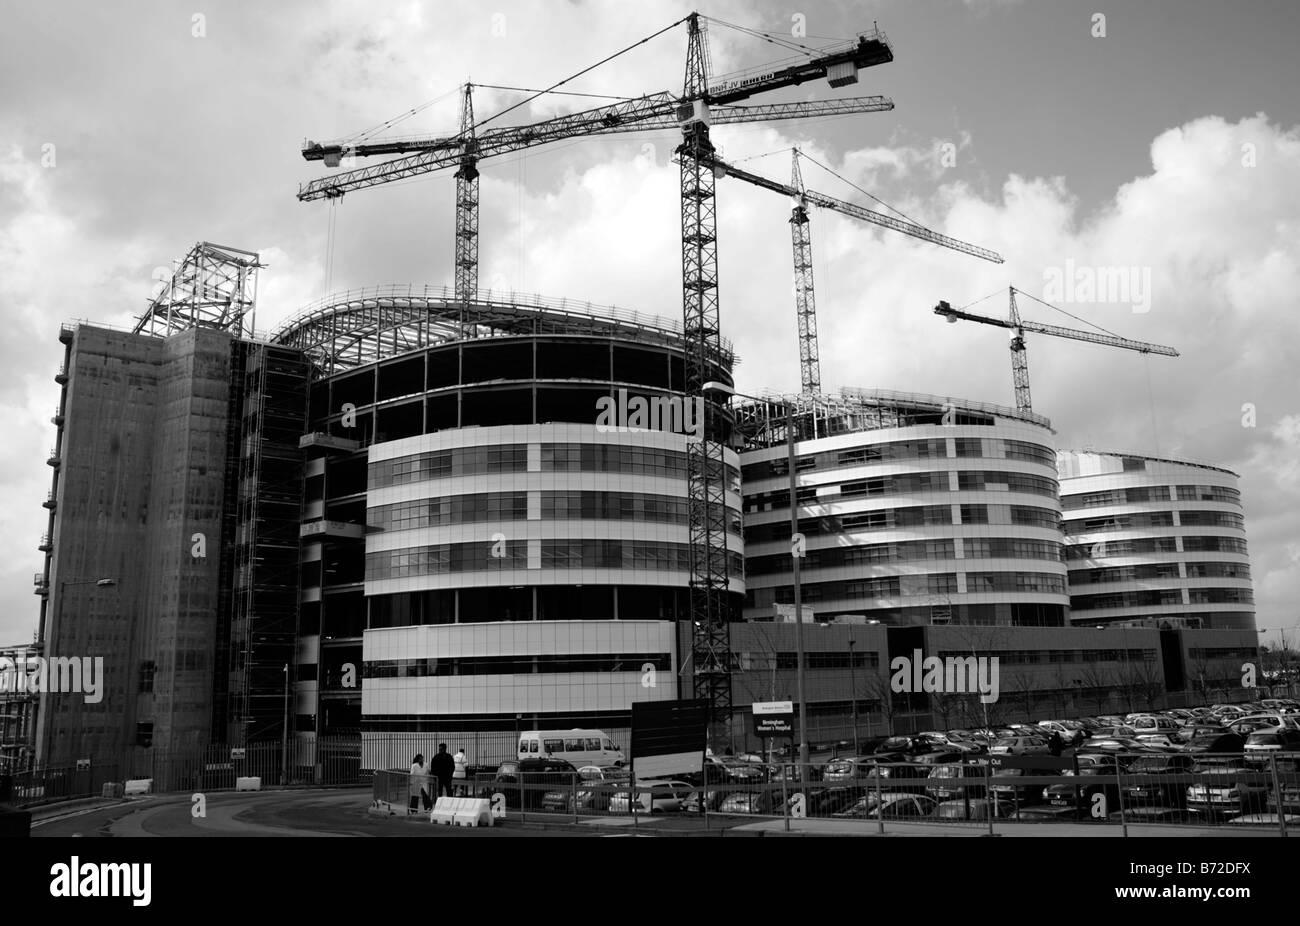 The new Queen Elizabeth Hospital, Edgbaston, Birmingham under construction. - Stock Image